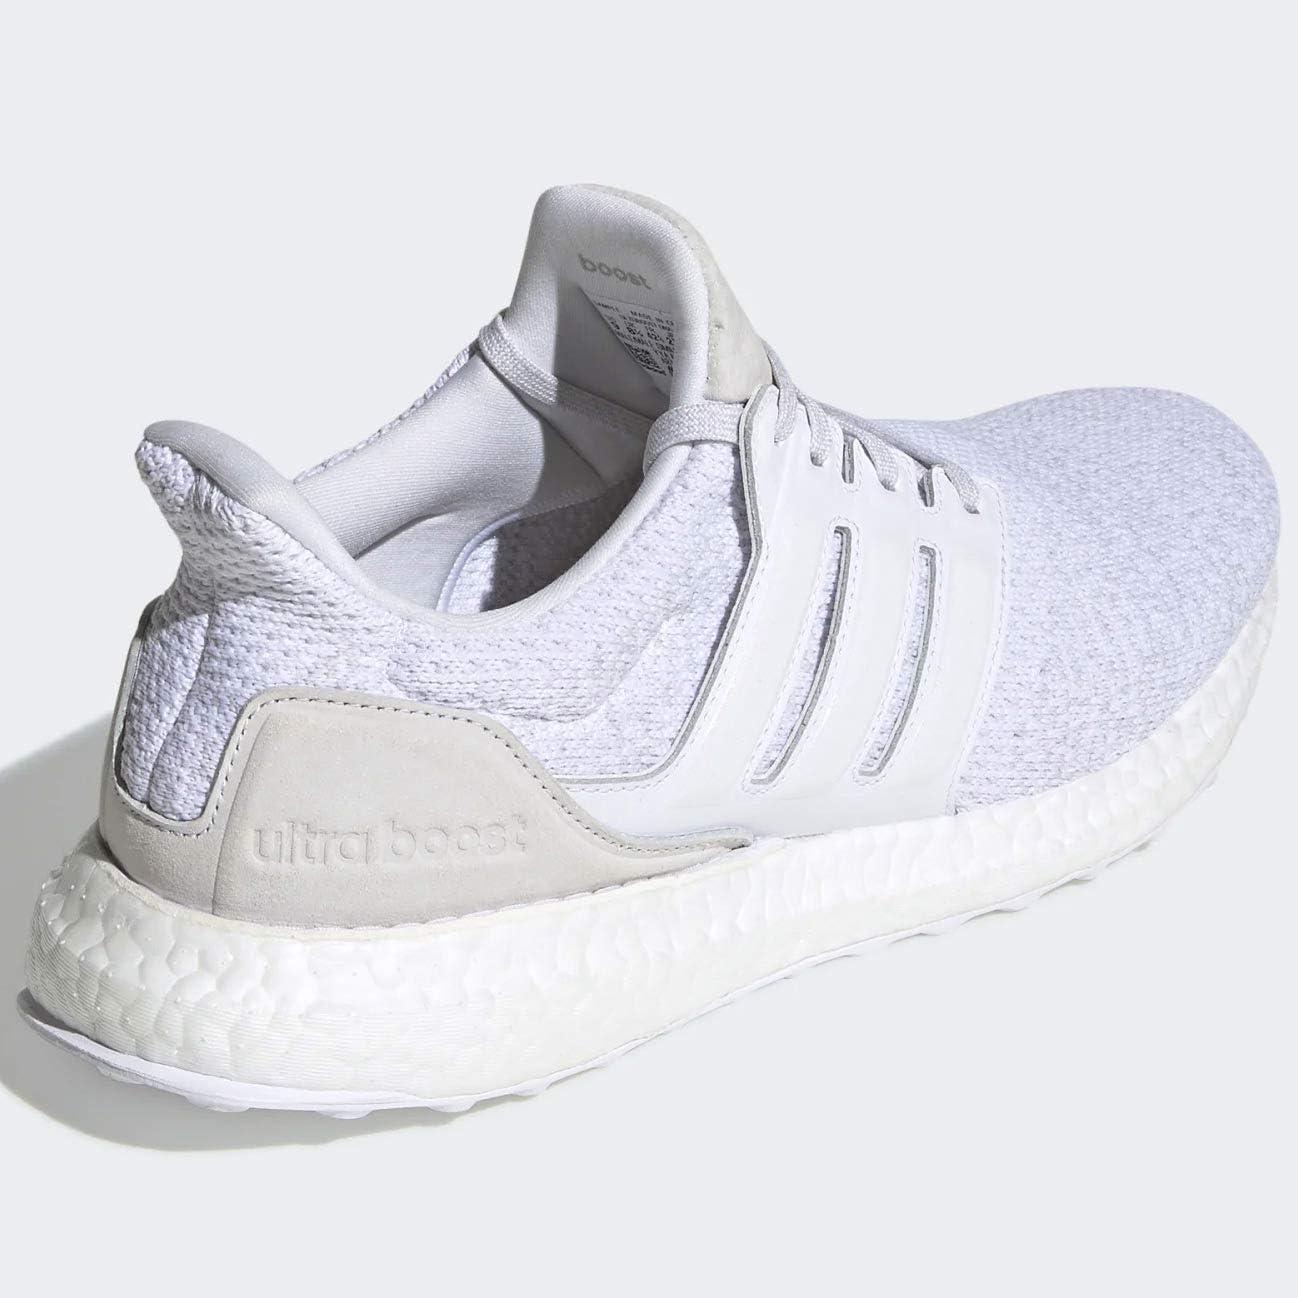 adidas Running Ultraboost DNA Calzature Bianco Calzature Bianco Grigio